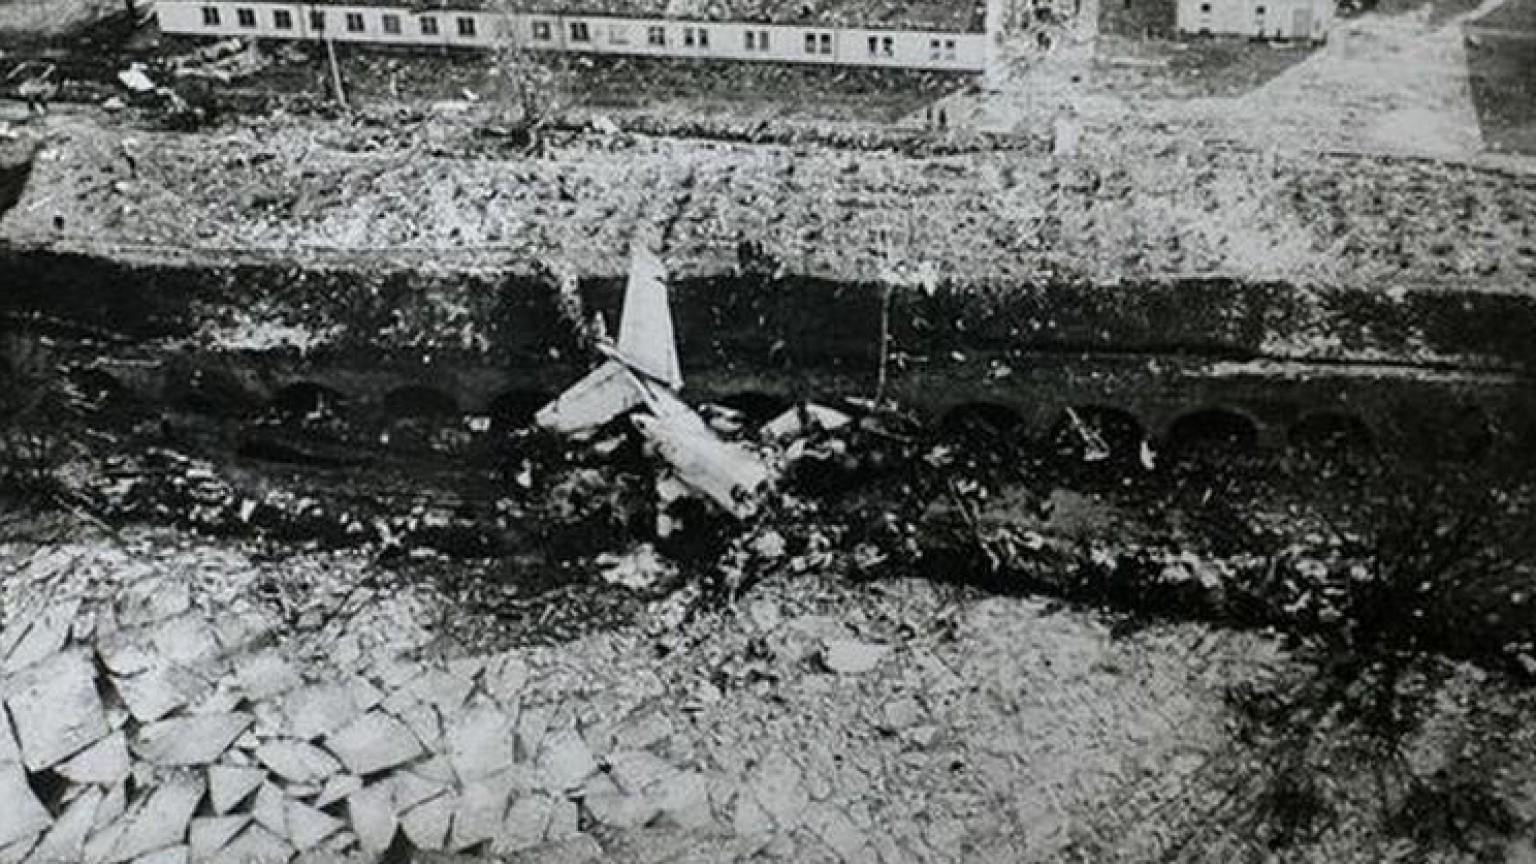 Zdjęcie dla kartki: Katastrofa samolotu Kopernik